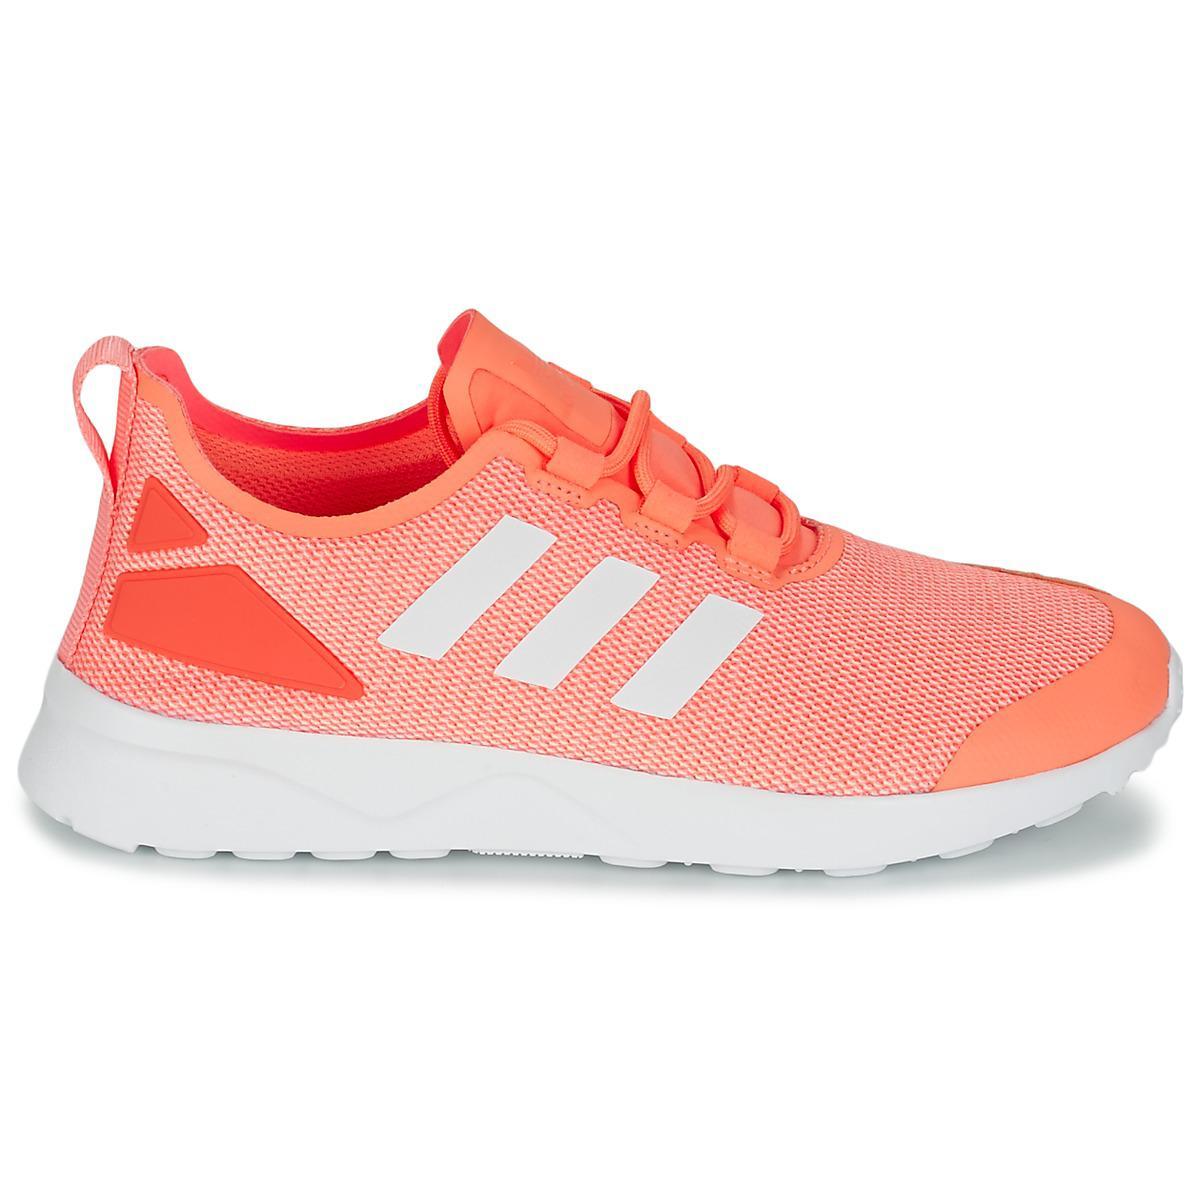 pretty nice 341c4 43d30 Adidas - ZX FLUX ADV VERVE W femmes Chaussures en orange - Lyst. Afficher  en plein écran